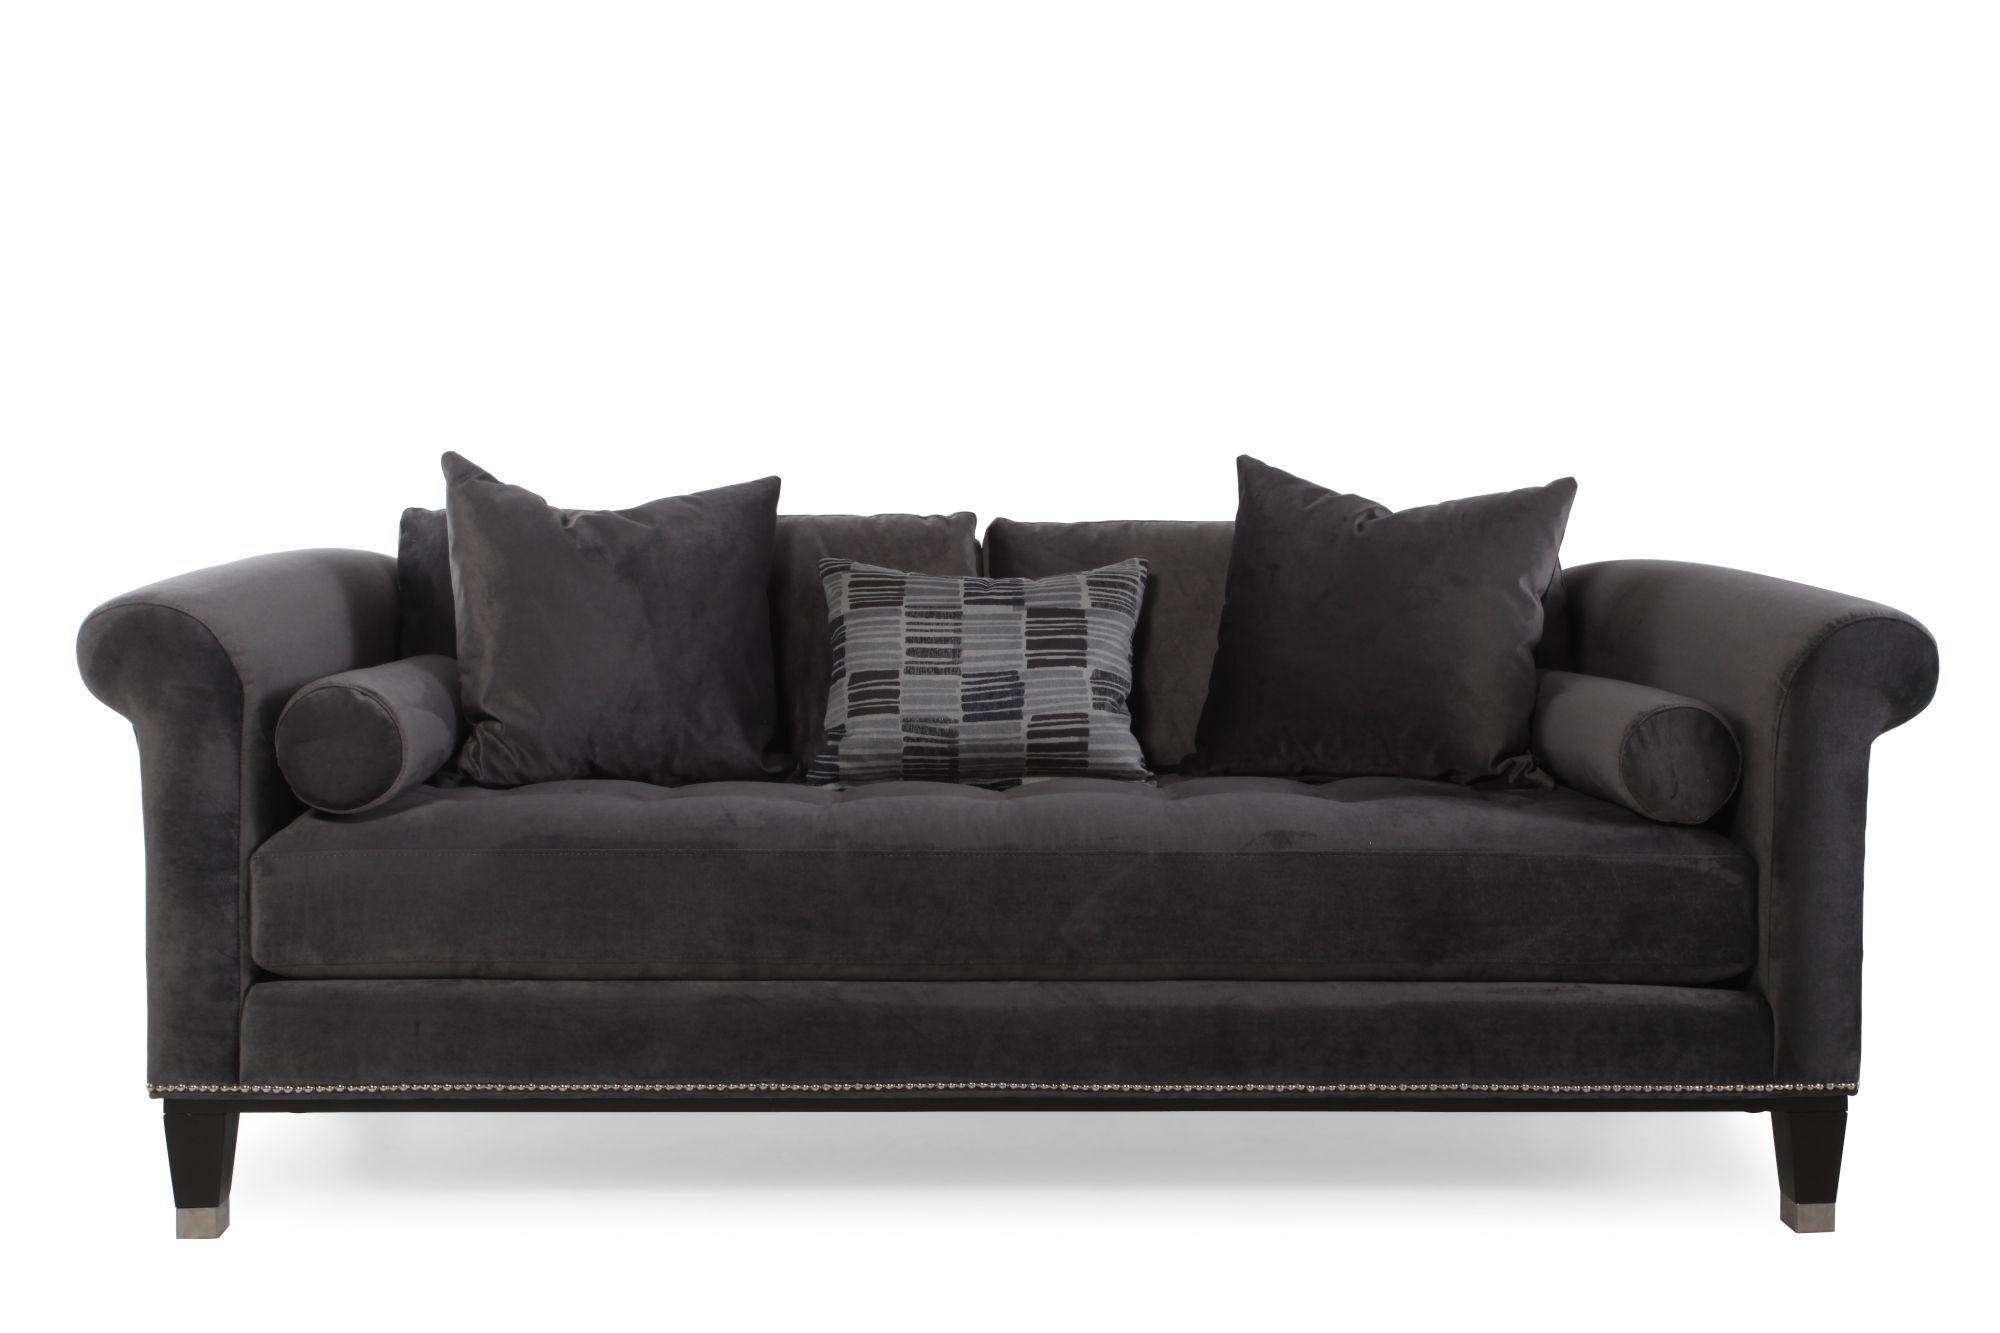 jonathan louis sofas children s ireland turner sofa mathis brothers furniture